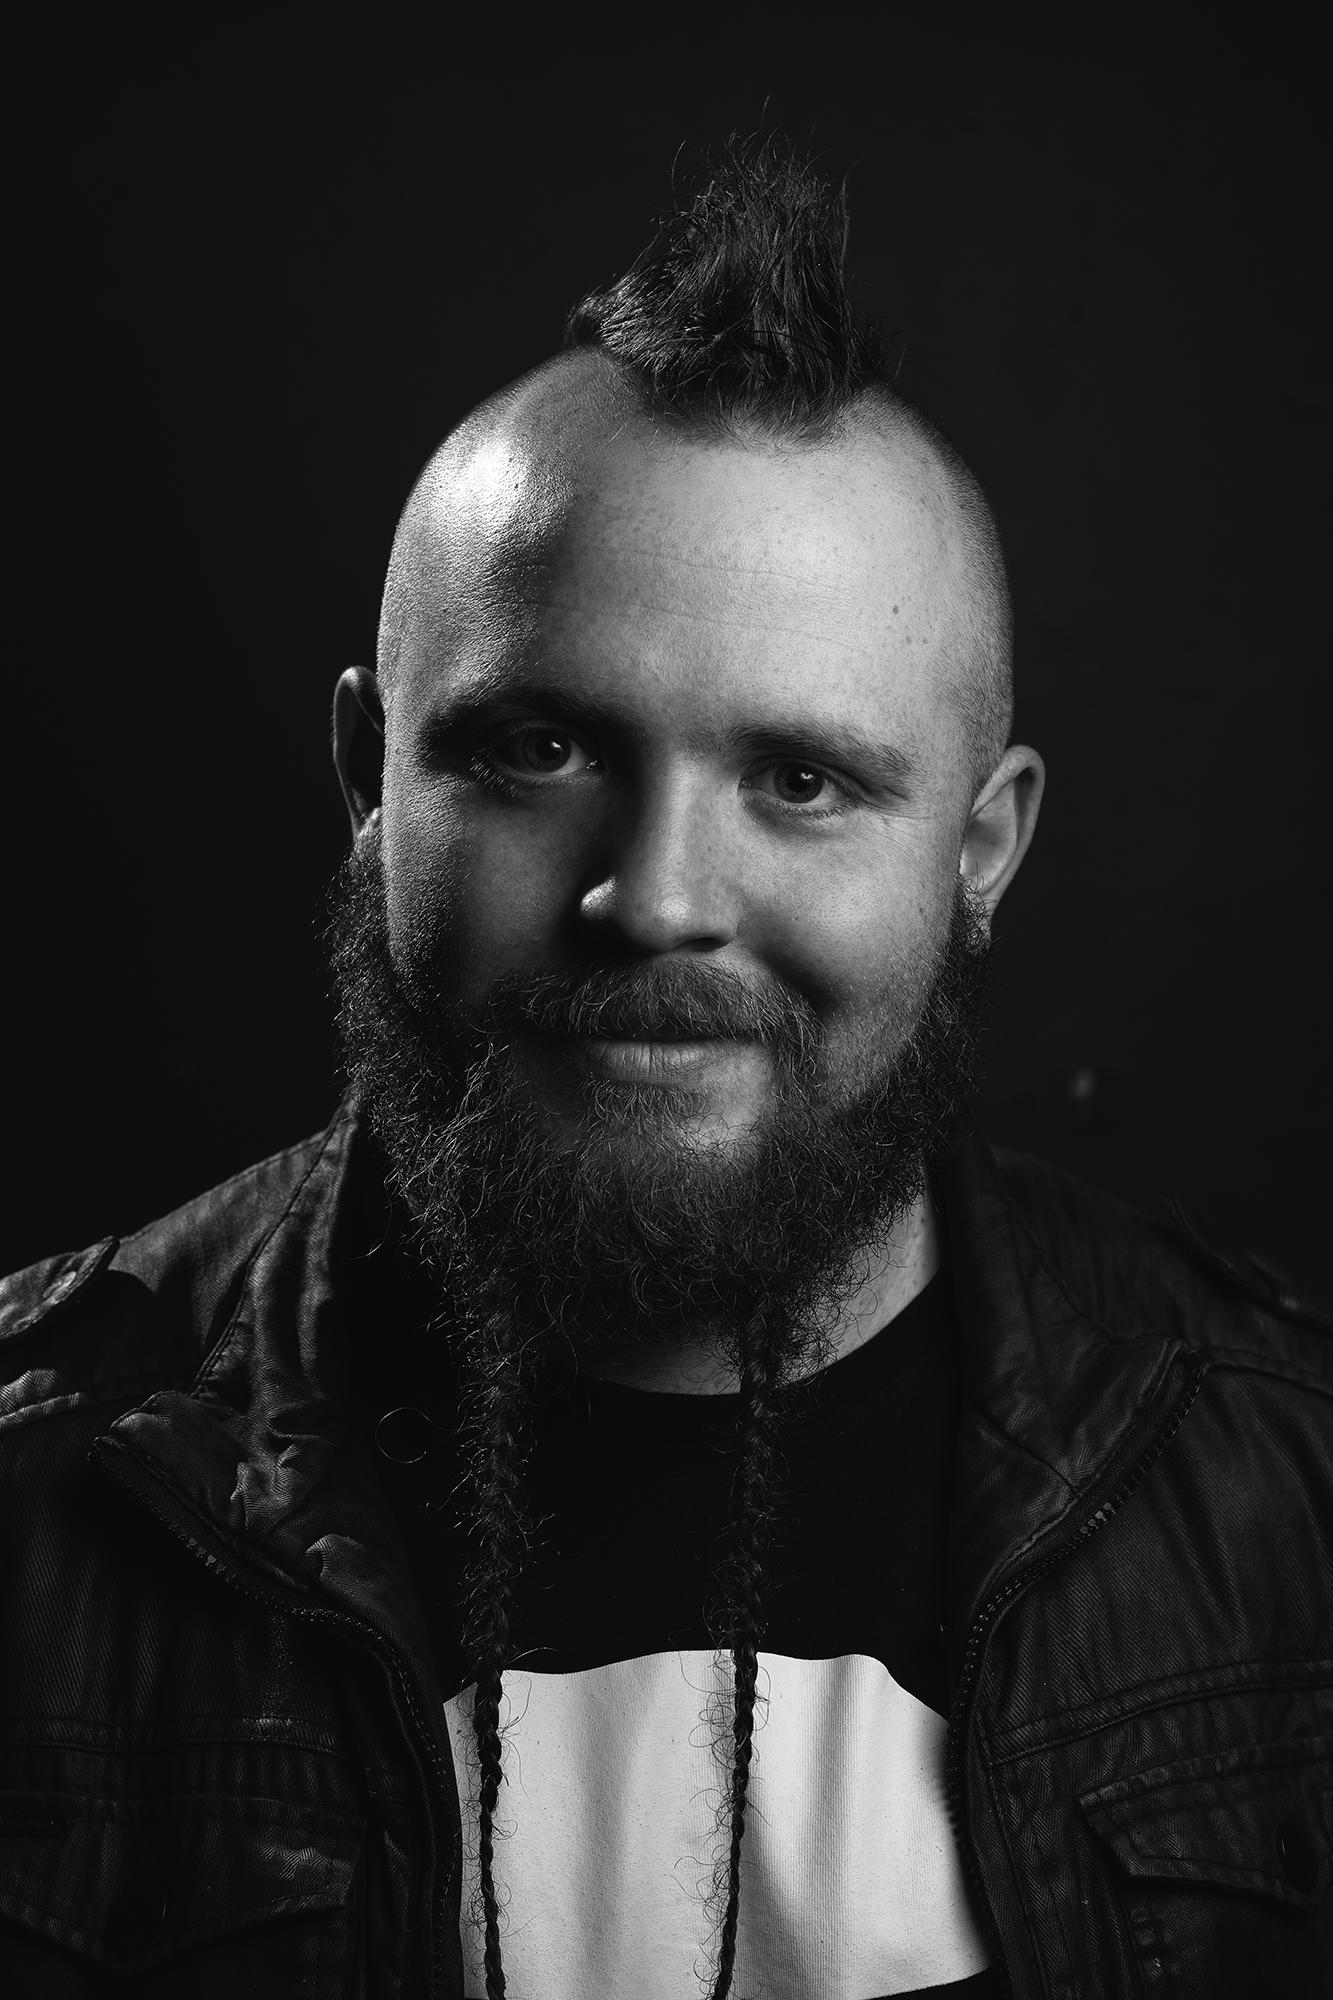 jacob maloney - BASSTOXICON